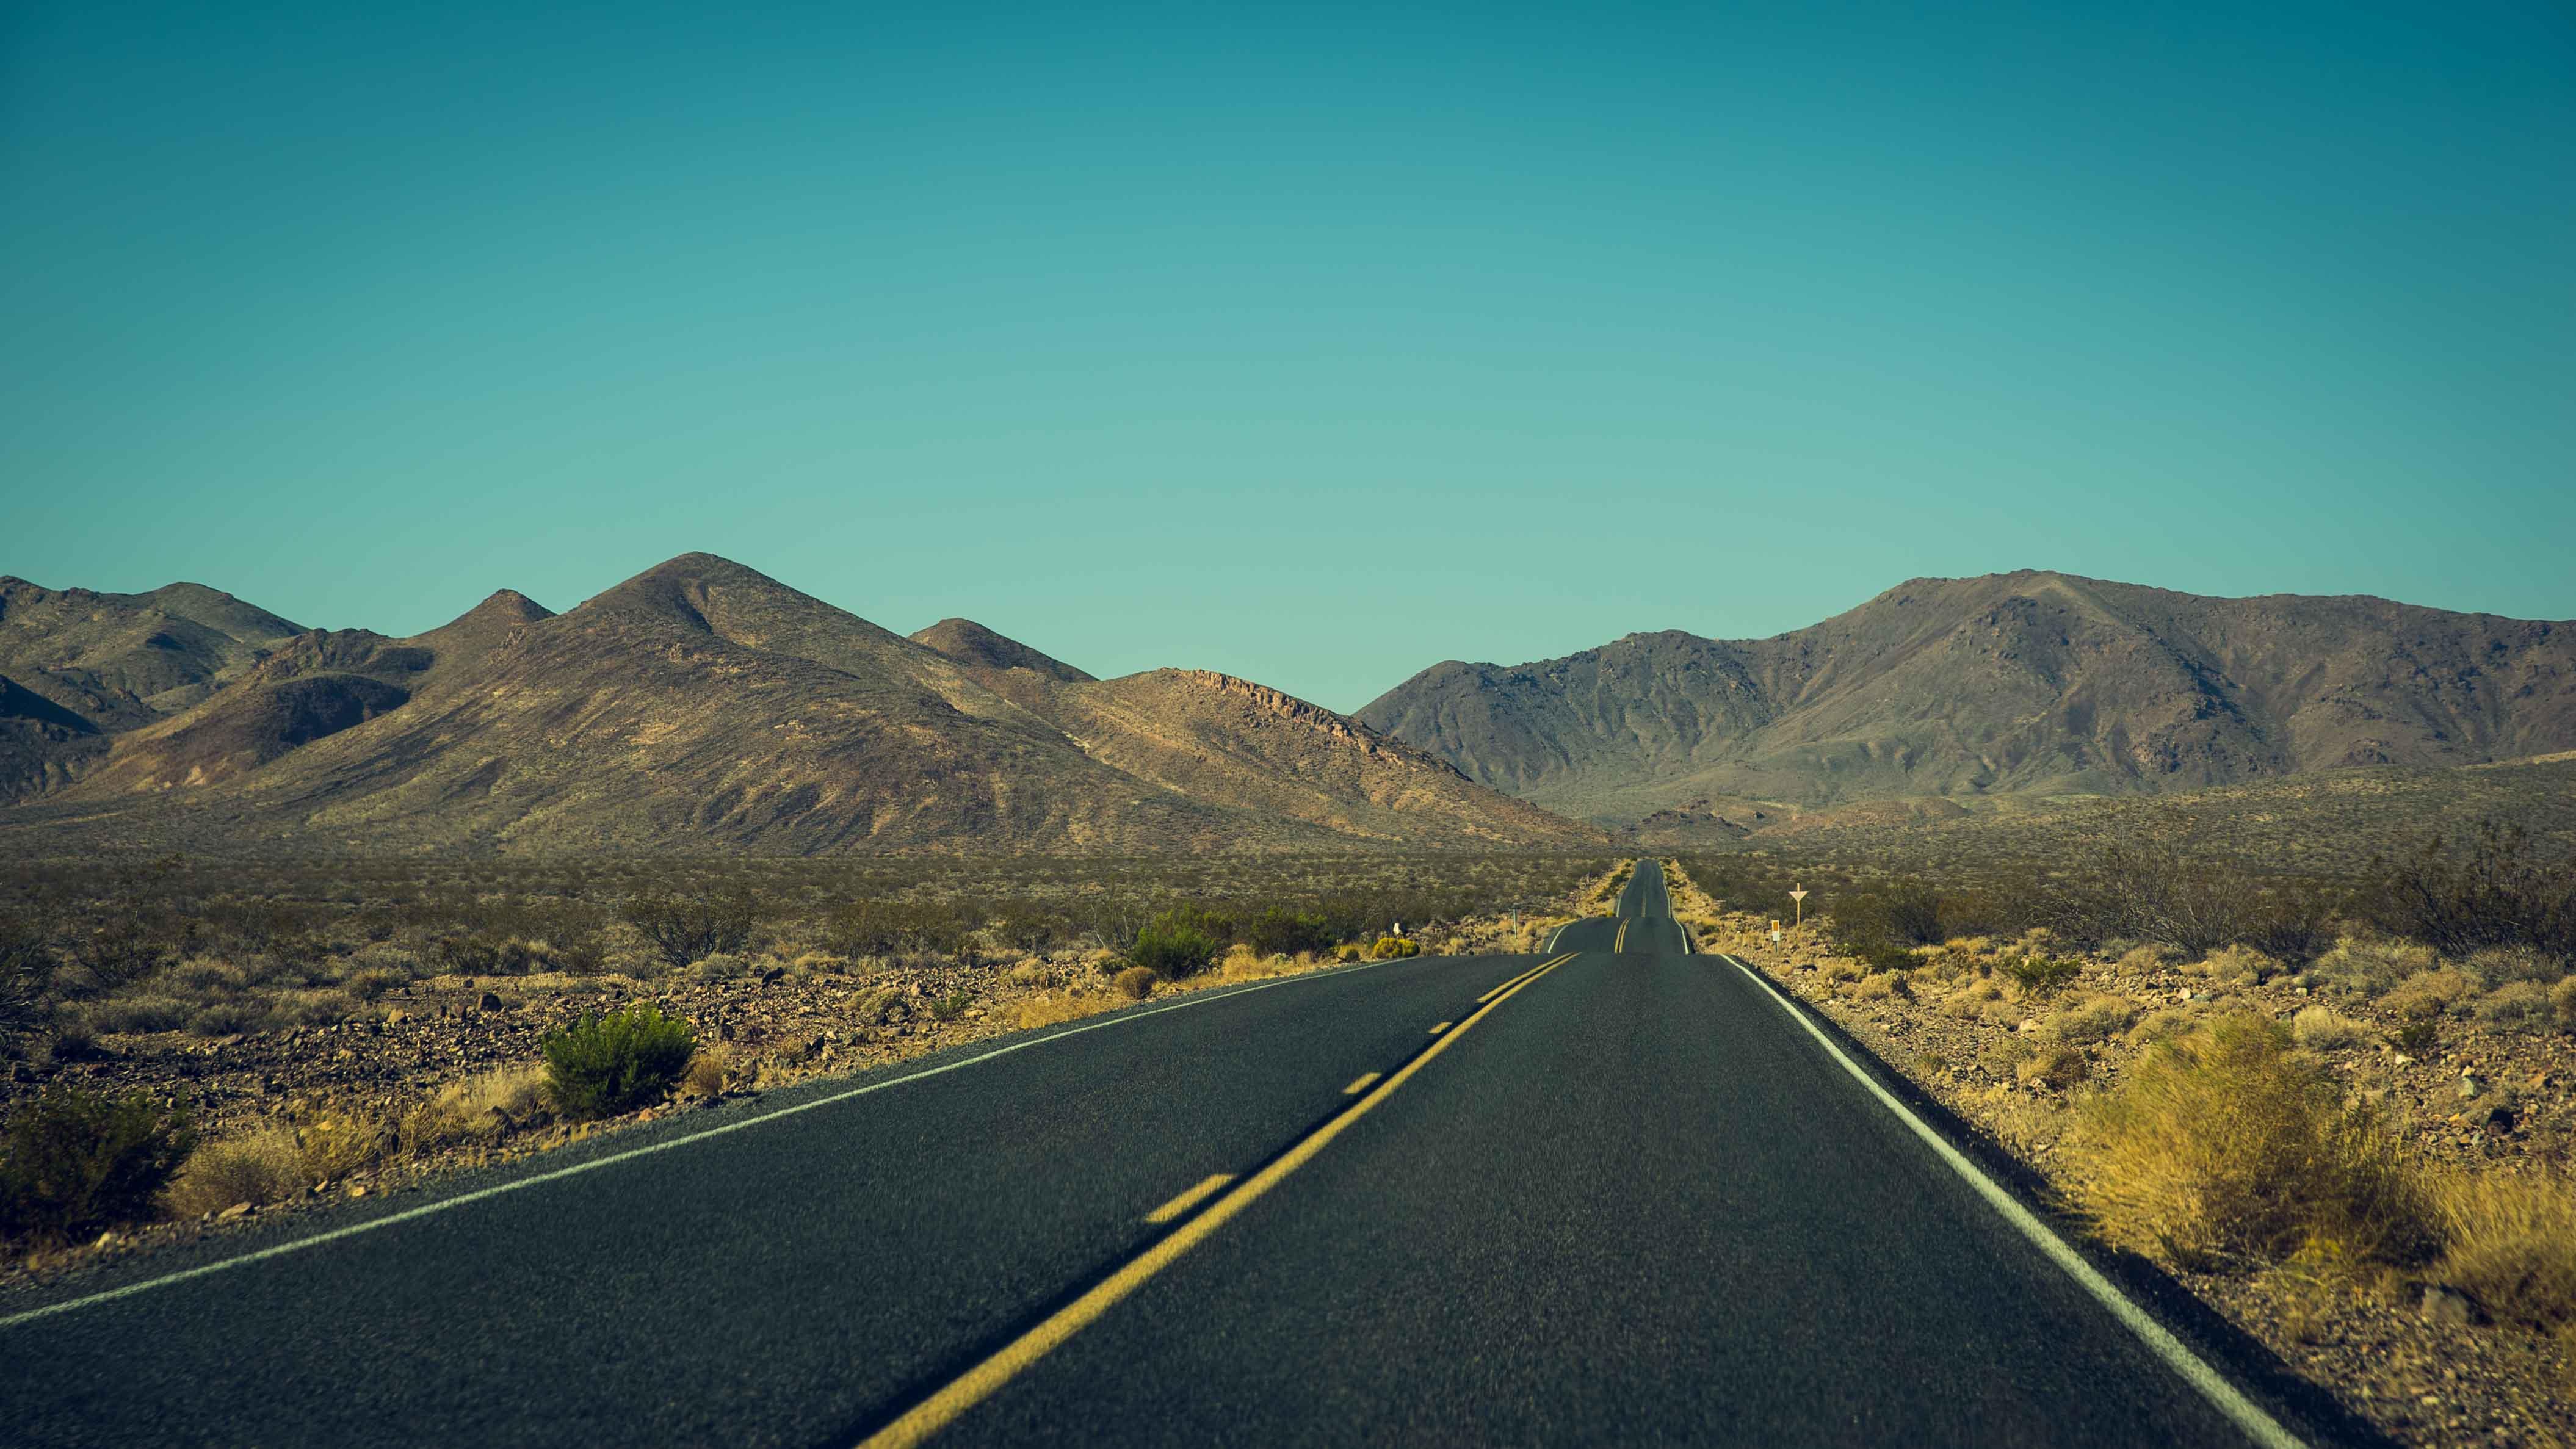 Beatty Death valley vallée de la mort Las Vegas Los Angeles San Francisco blog carnet de voyage désert montagnes